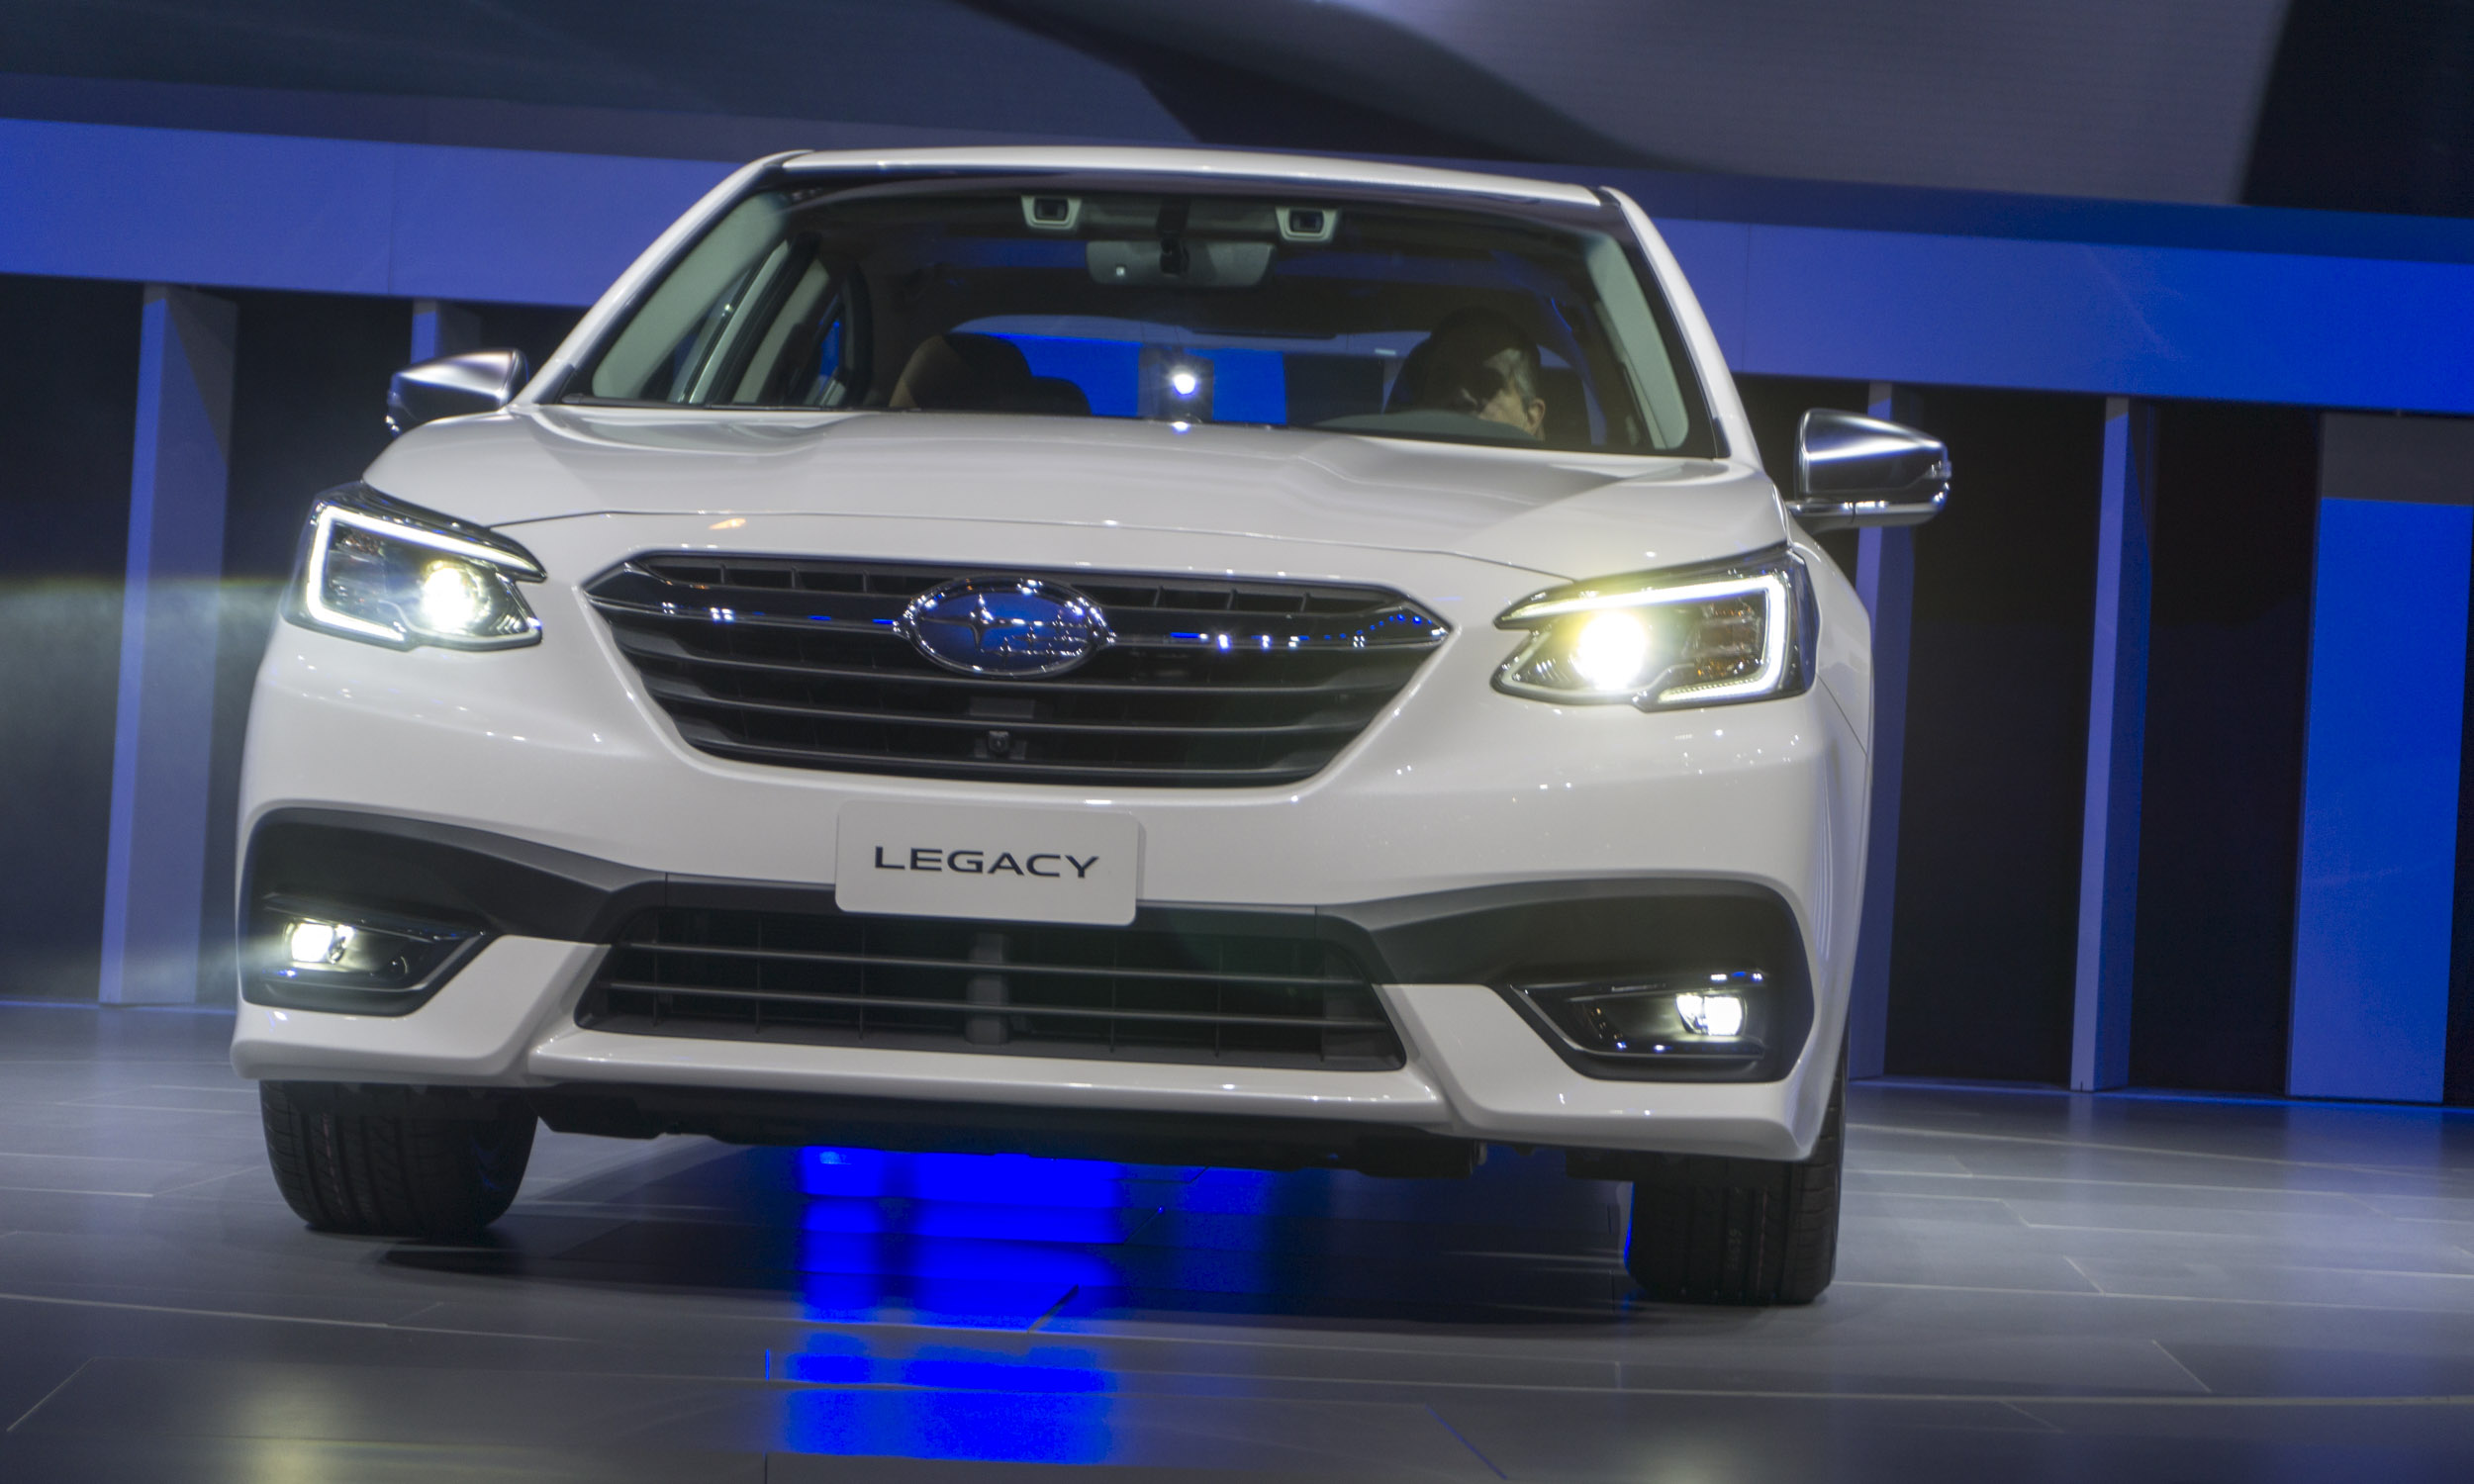 2019 Chicago Auto Show 2020 Subaru Legacynbsp